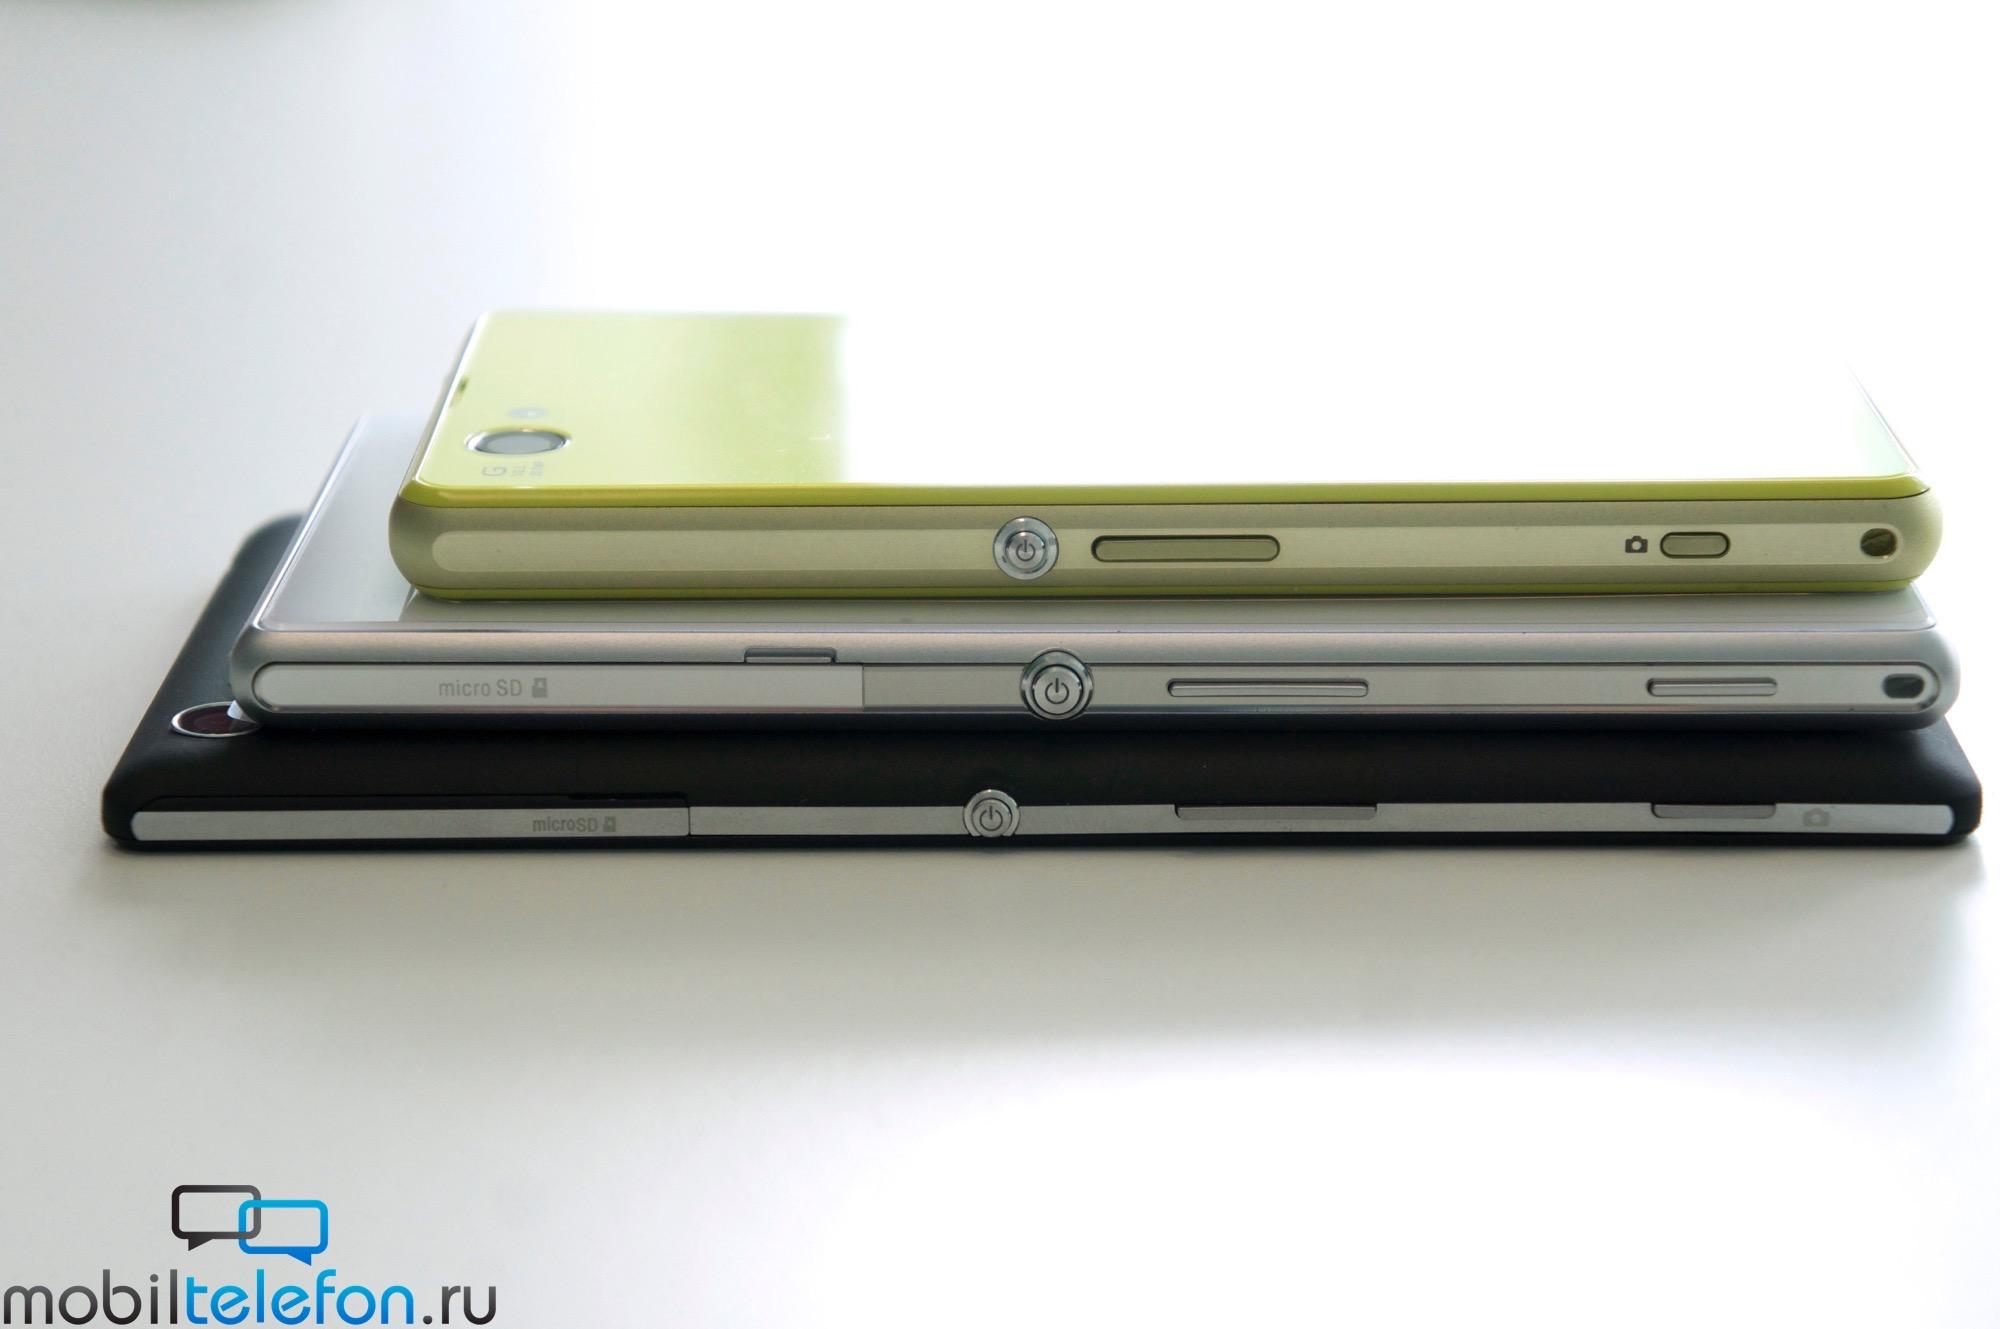 Xperia T3 vs Z2 vs Z1 Compact